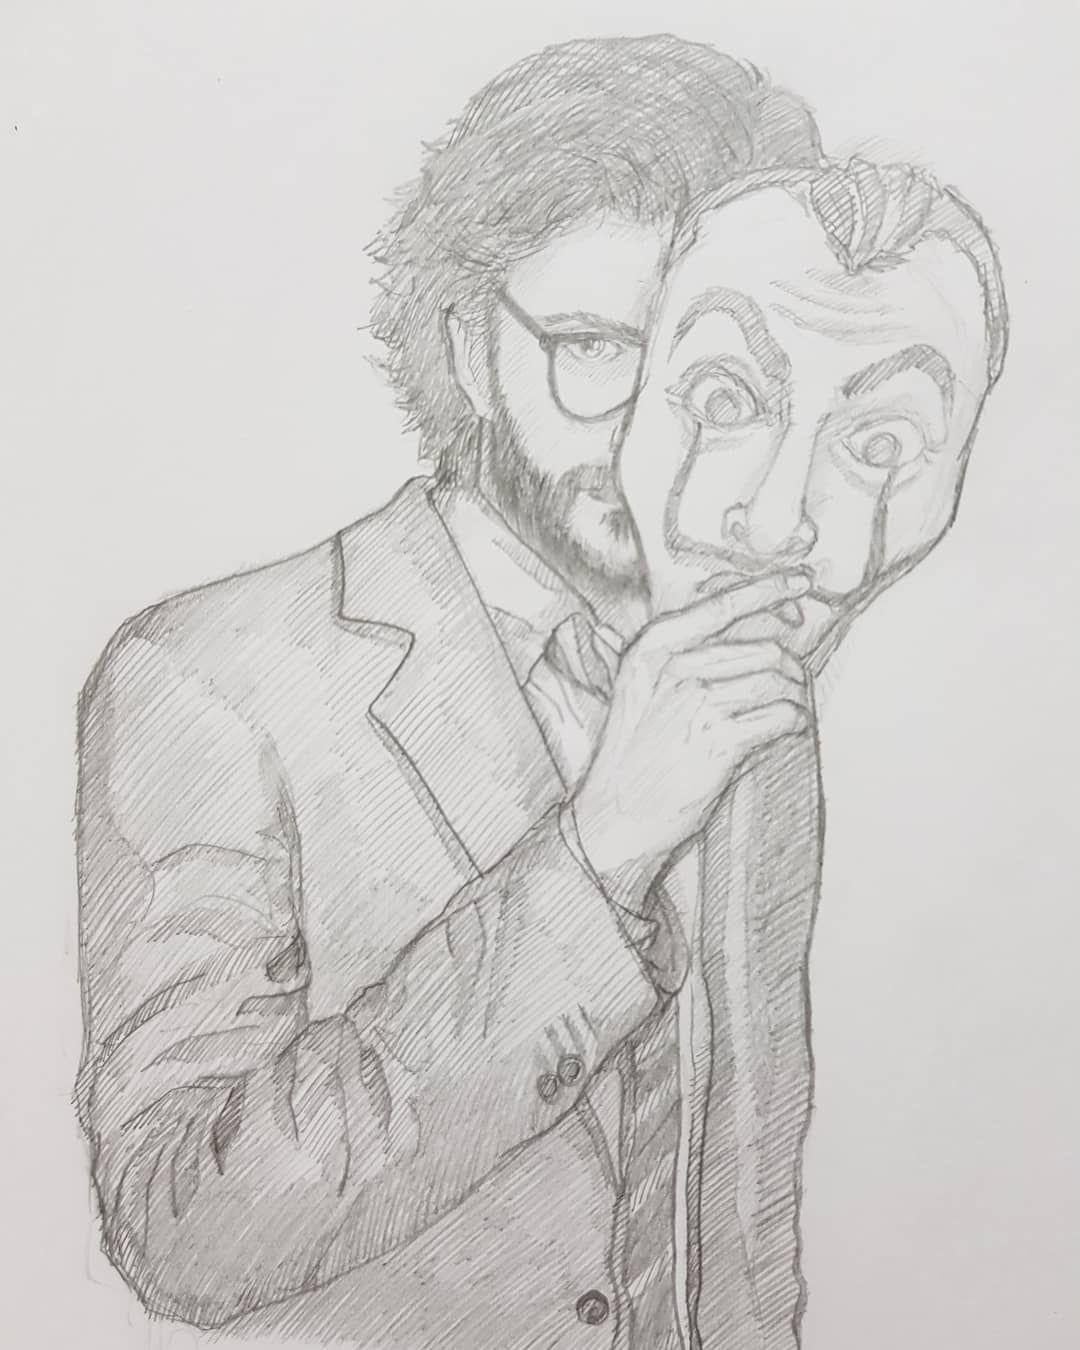 El Profesor referenceused 模写 鉛筆画 人物画 illustration